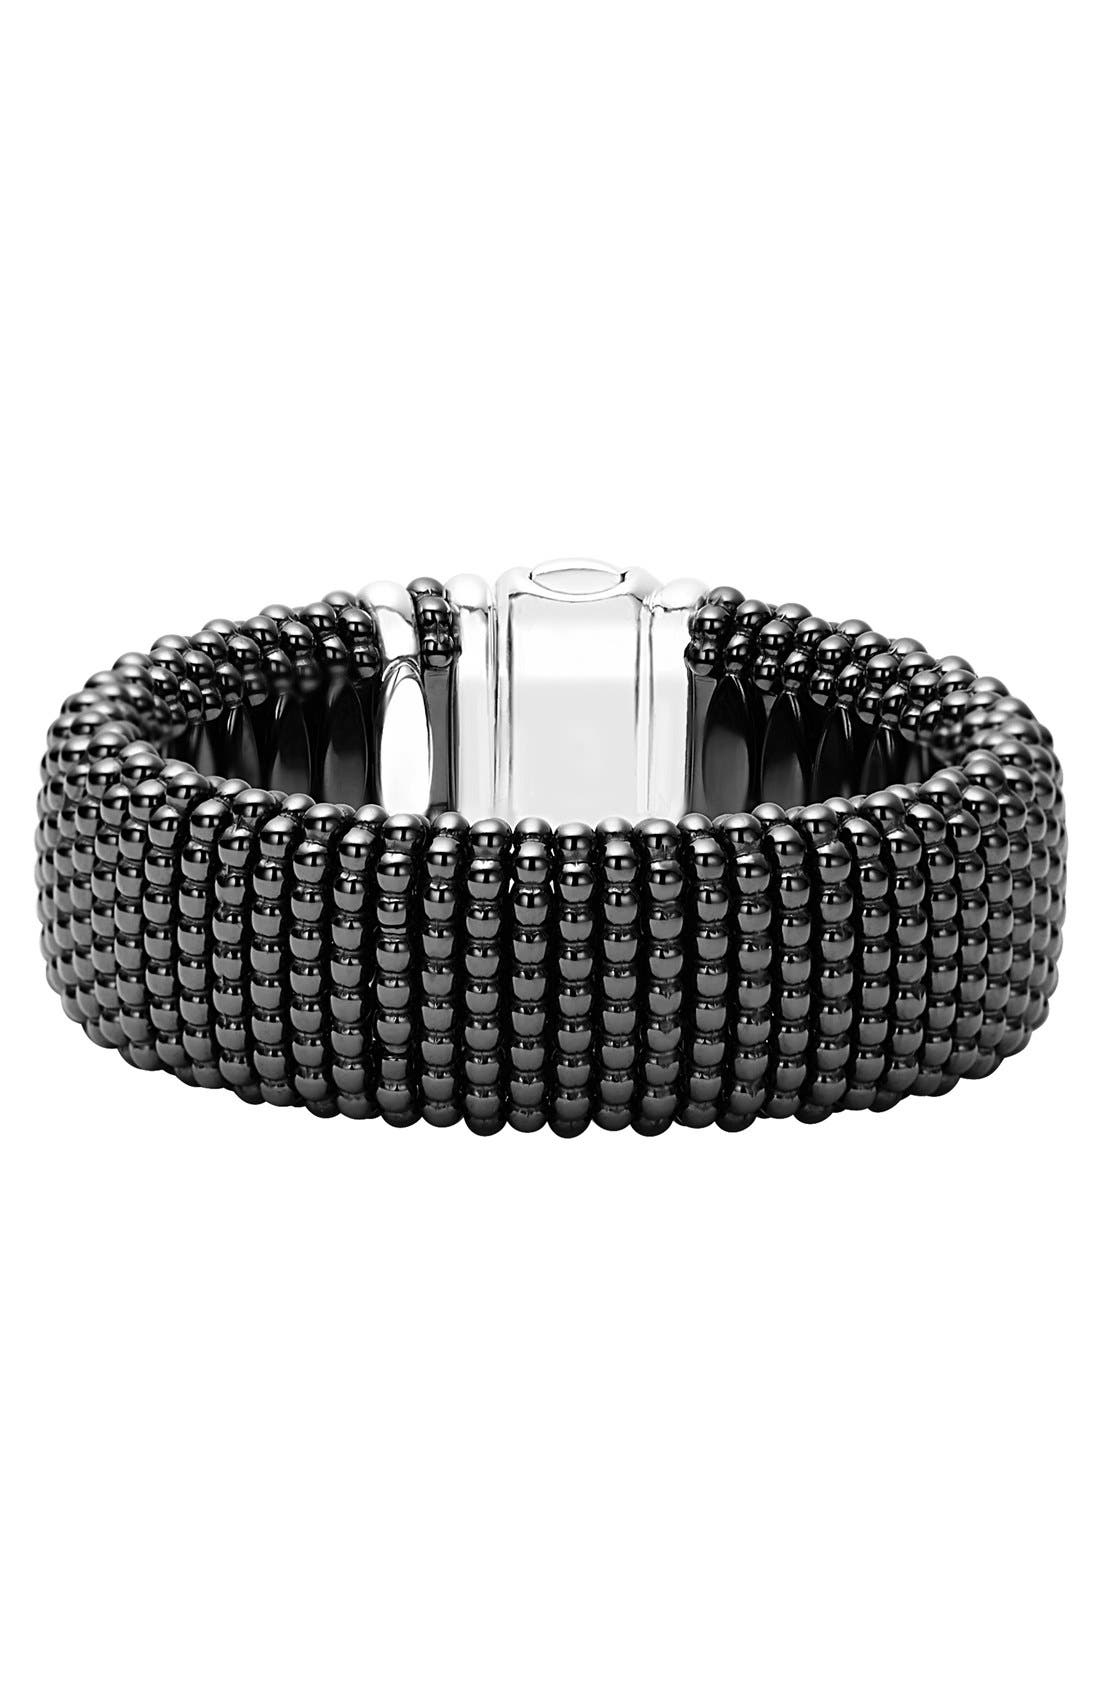 'Caviar Rope' Bracelet,                             Main thumbnail 1, color,                             BLACK/ GOLD